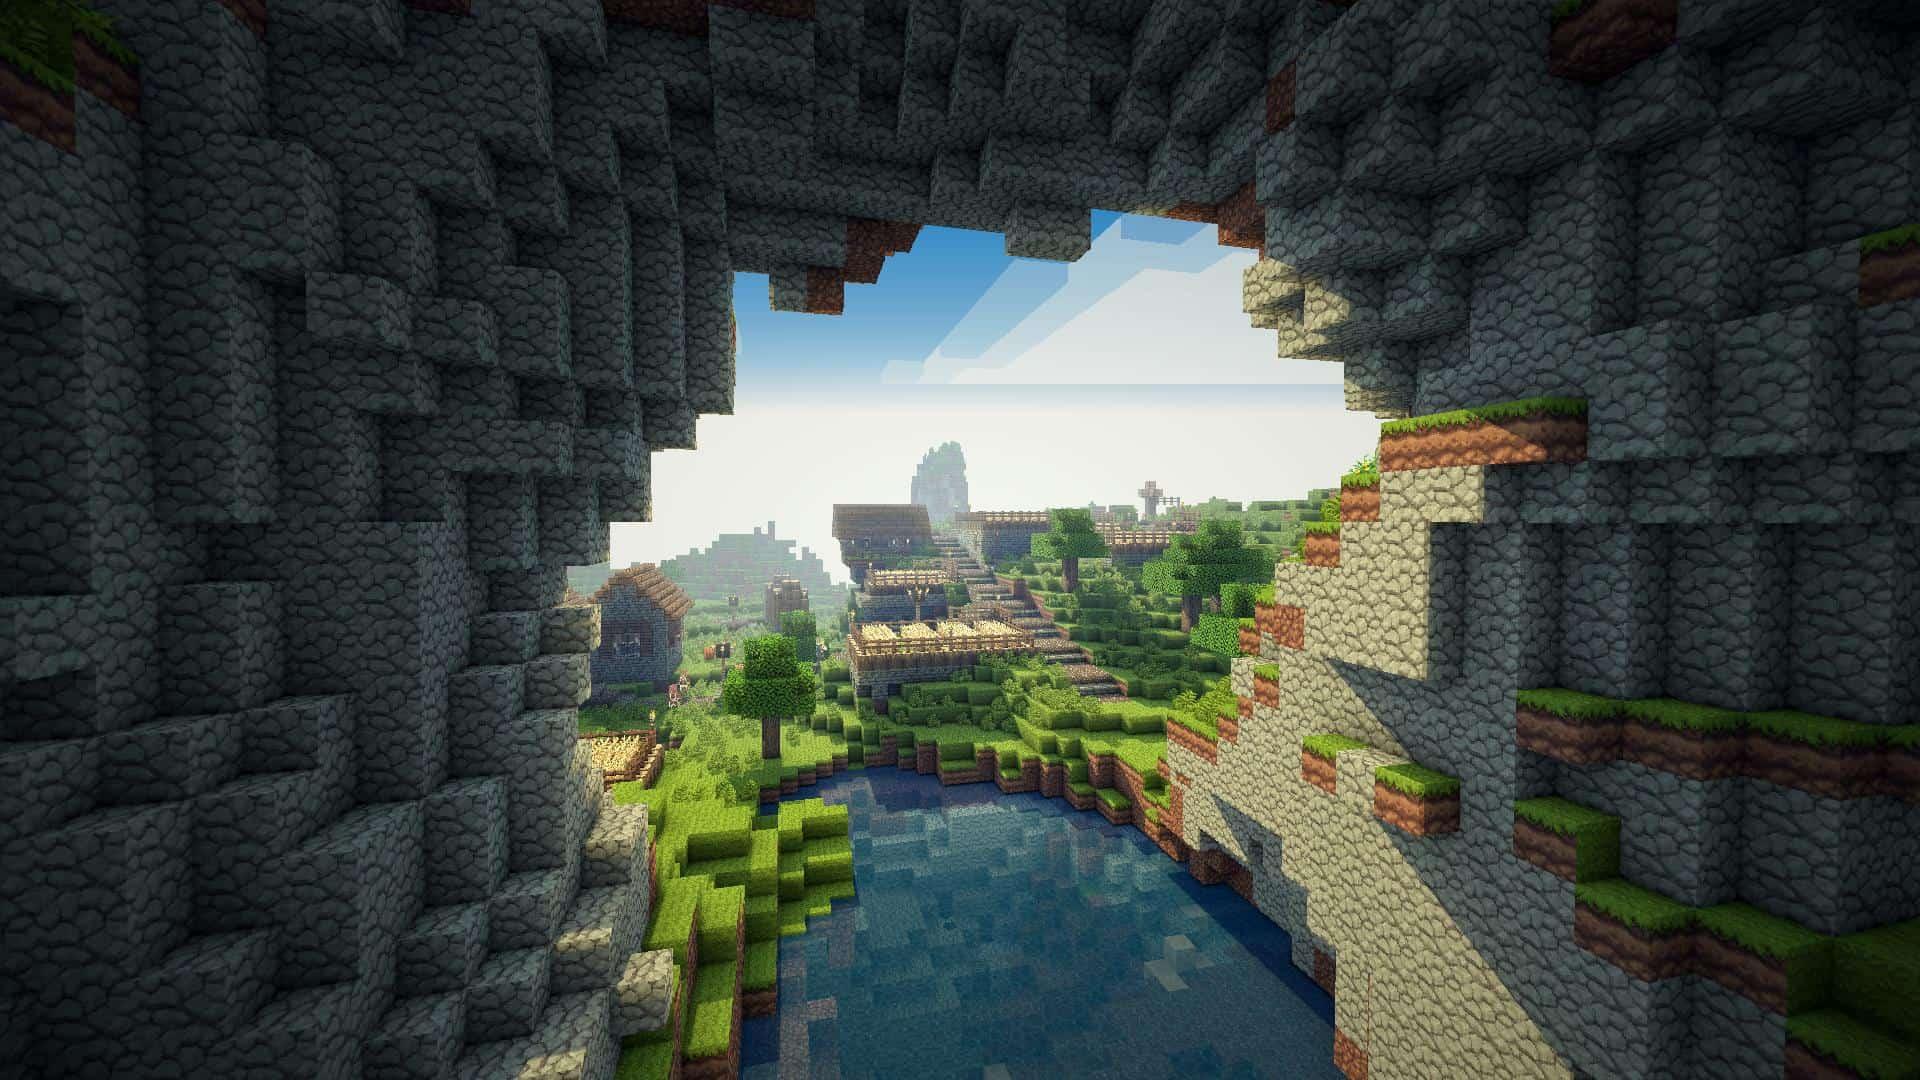 Minecraft senic view cavae city